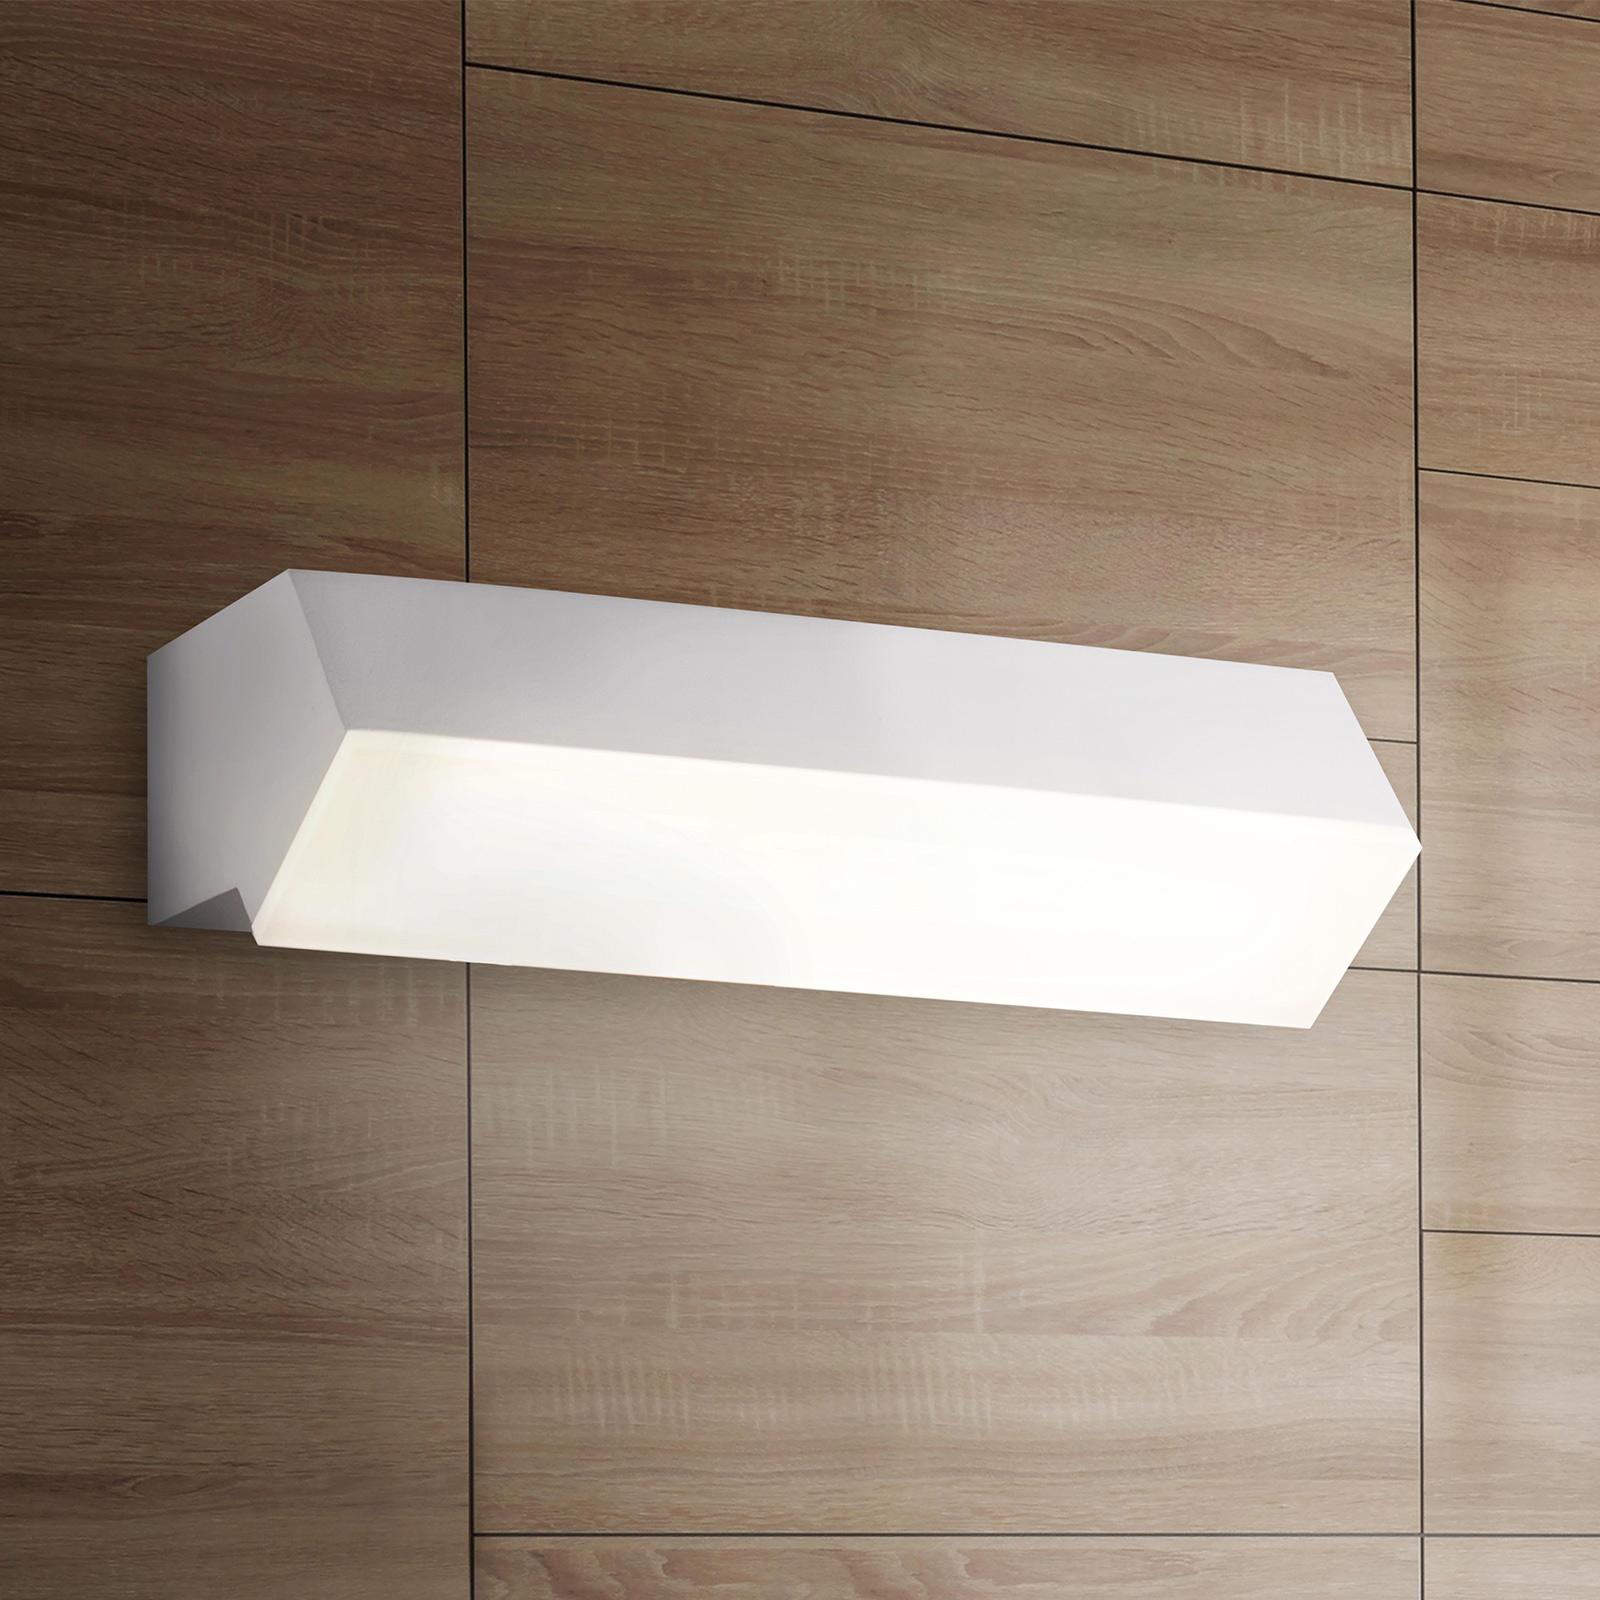 LED-seinävalaisin Toni, leveys 20,5 cm